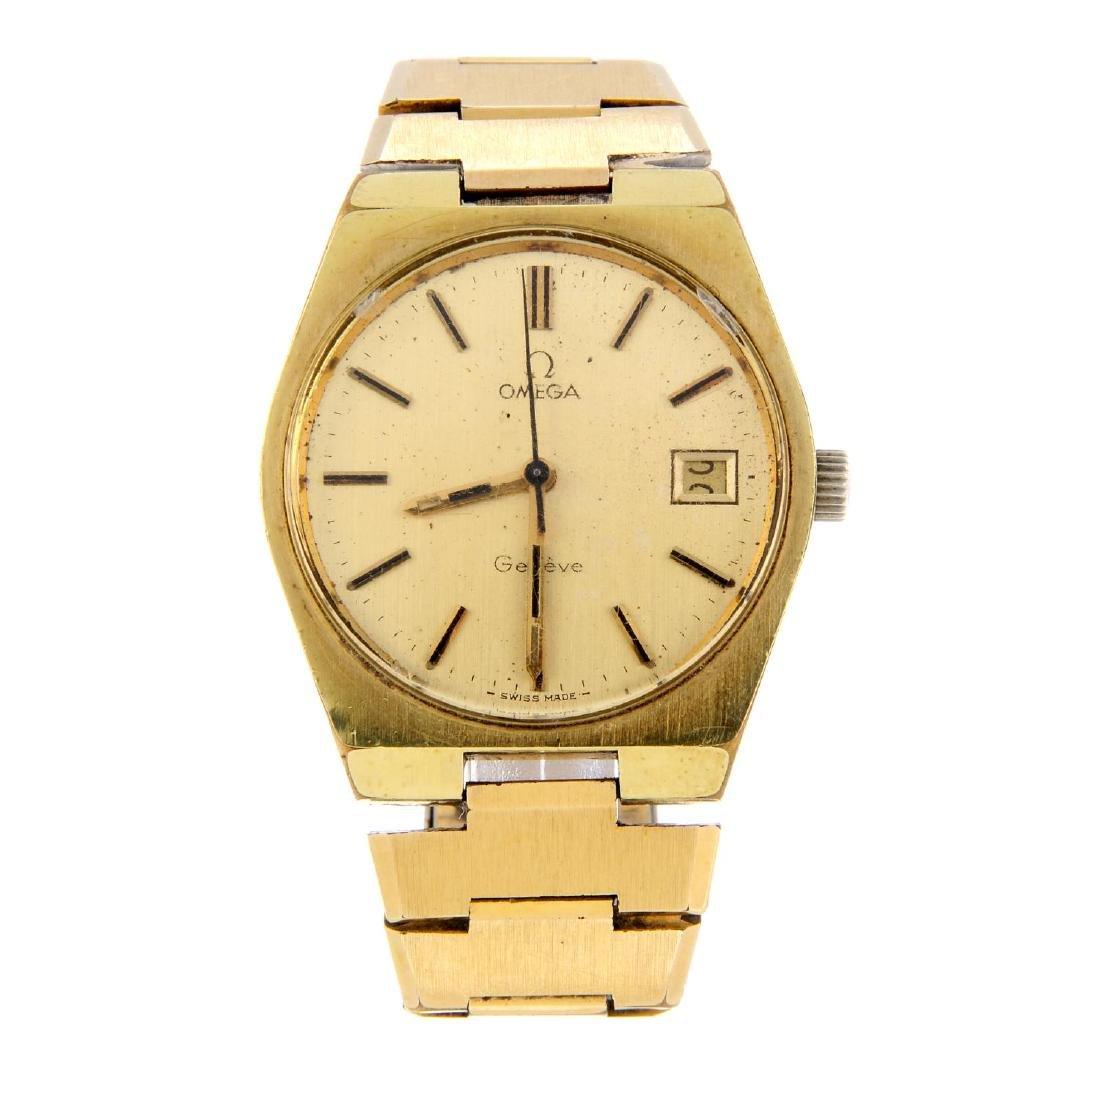 OMEGA - a gentleman's Genève bracelet watch. Gold